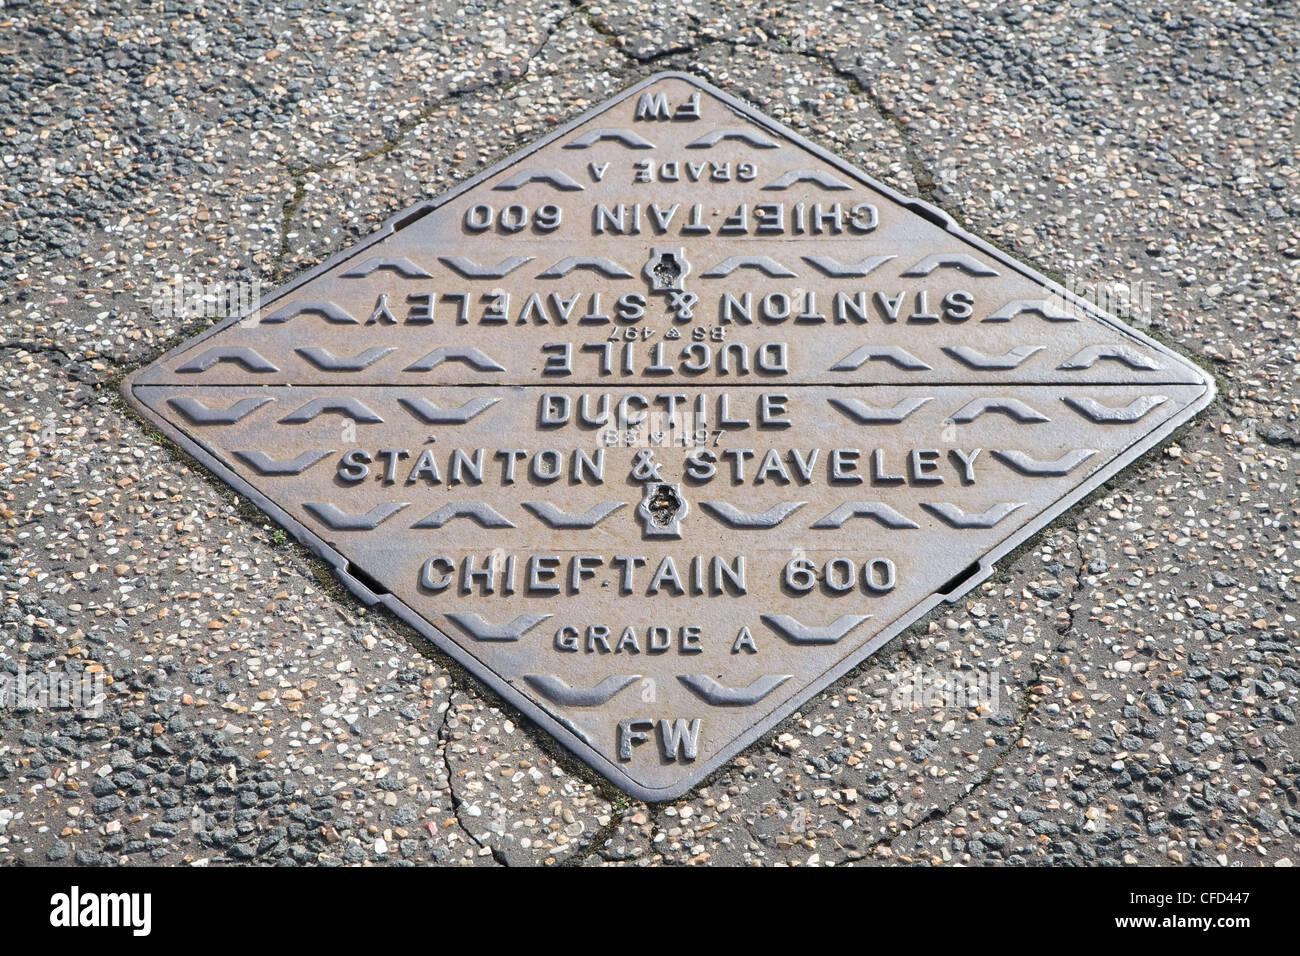 Iron manhole cover tarmac road - Stock Image